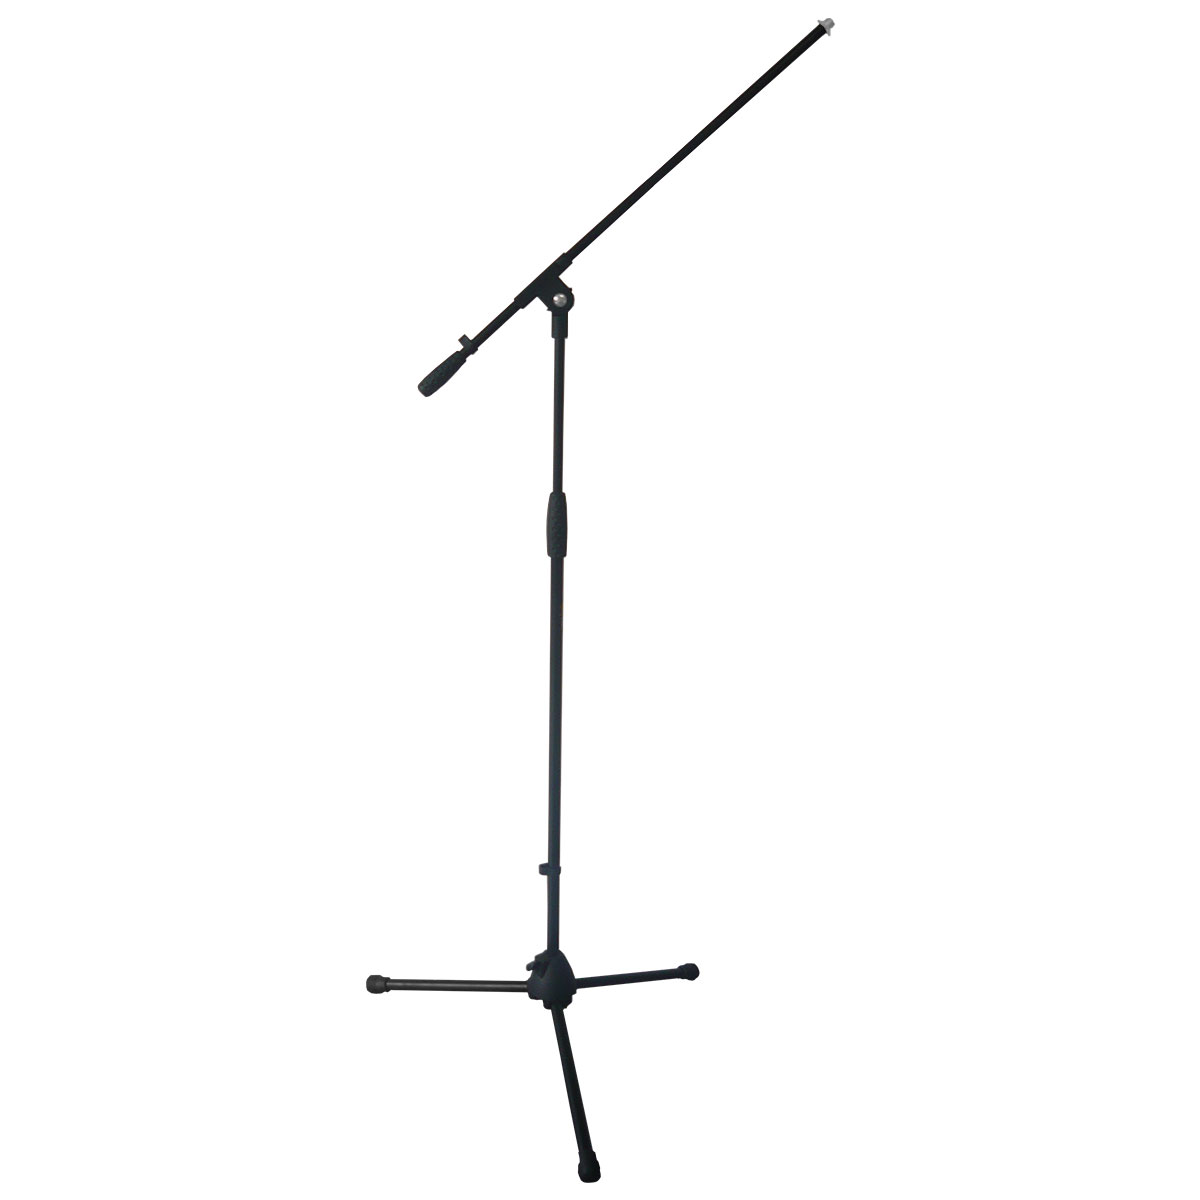 116 - Pedestal p/ Microfone tipo Girafa 116 - TBS